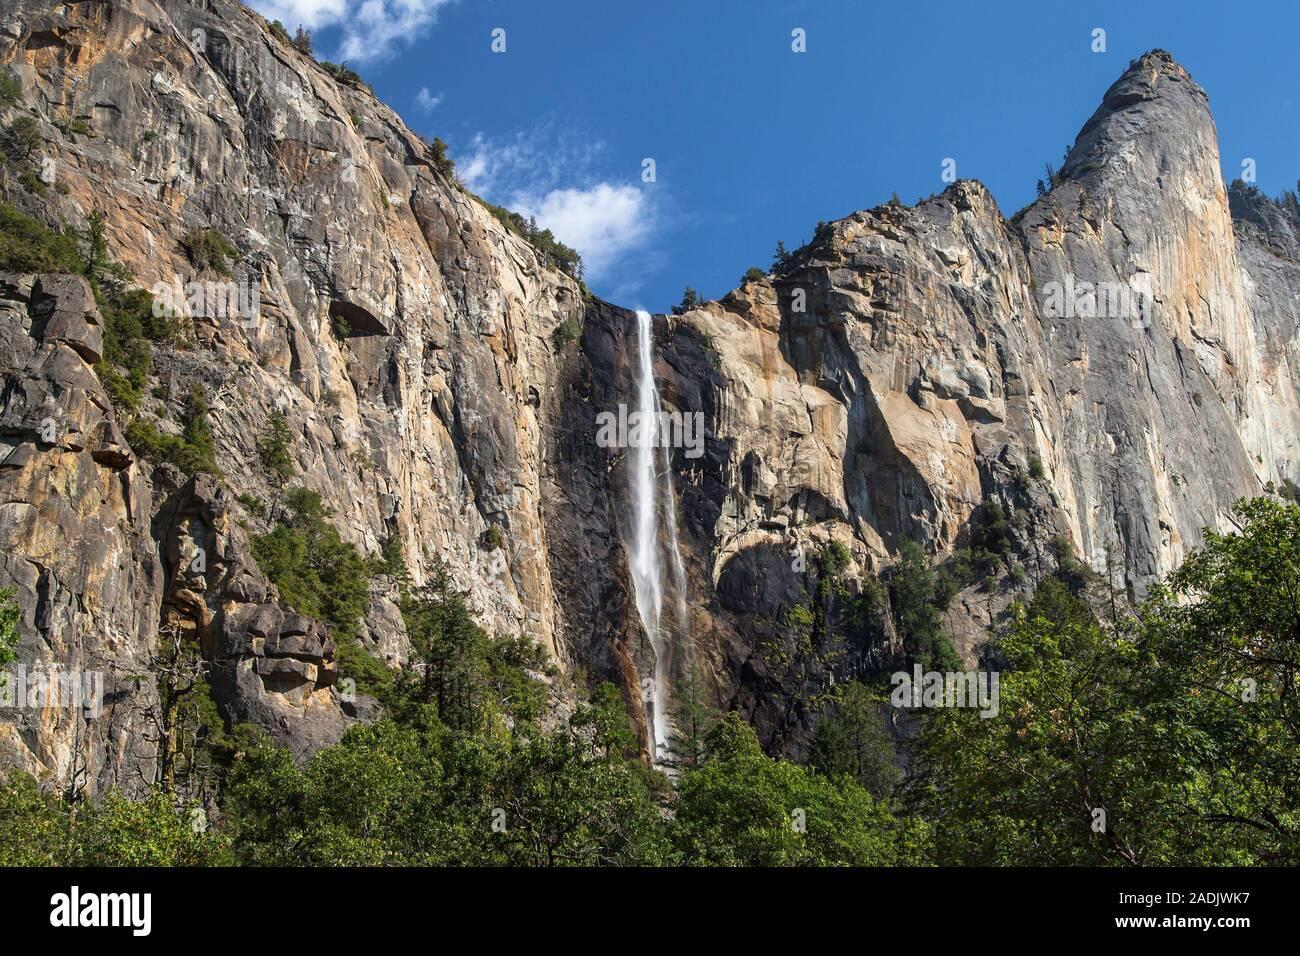 Bridalveil Fall and Leaning Tower, Yosemite National Park, California, USA. Stock Photo